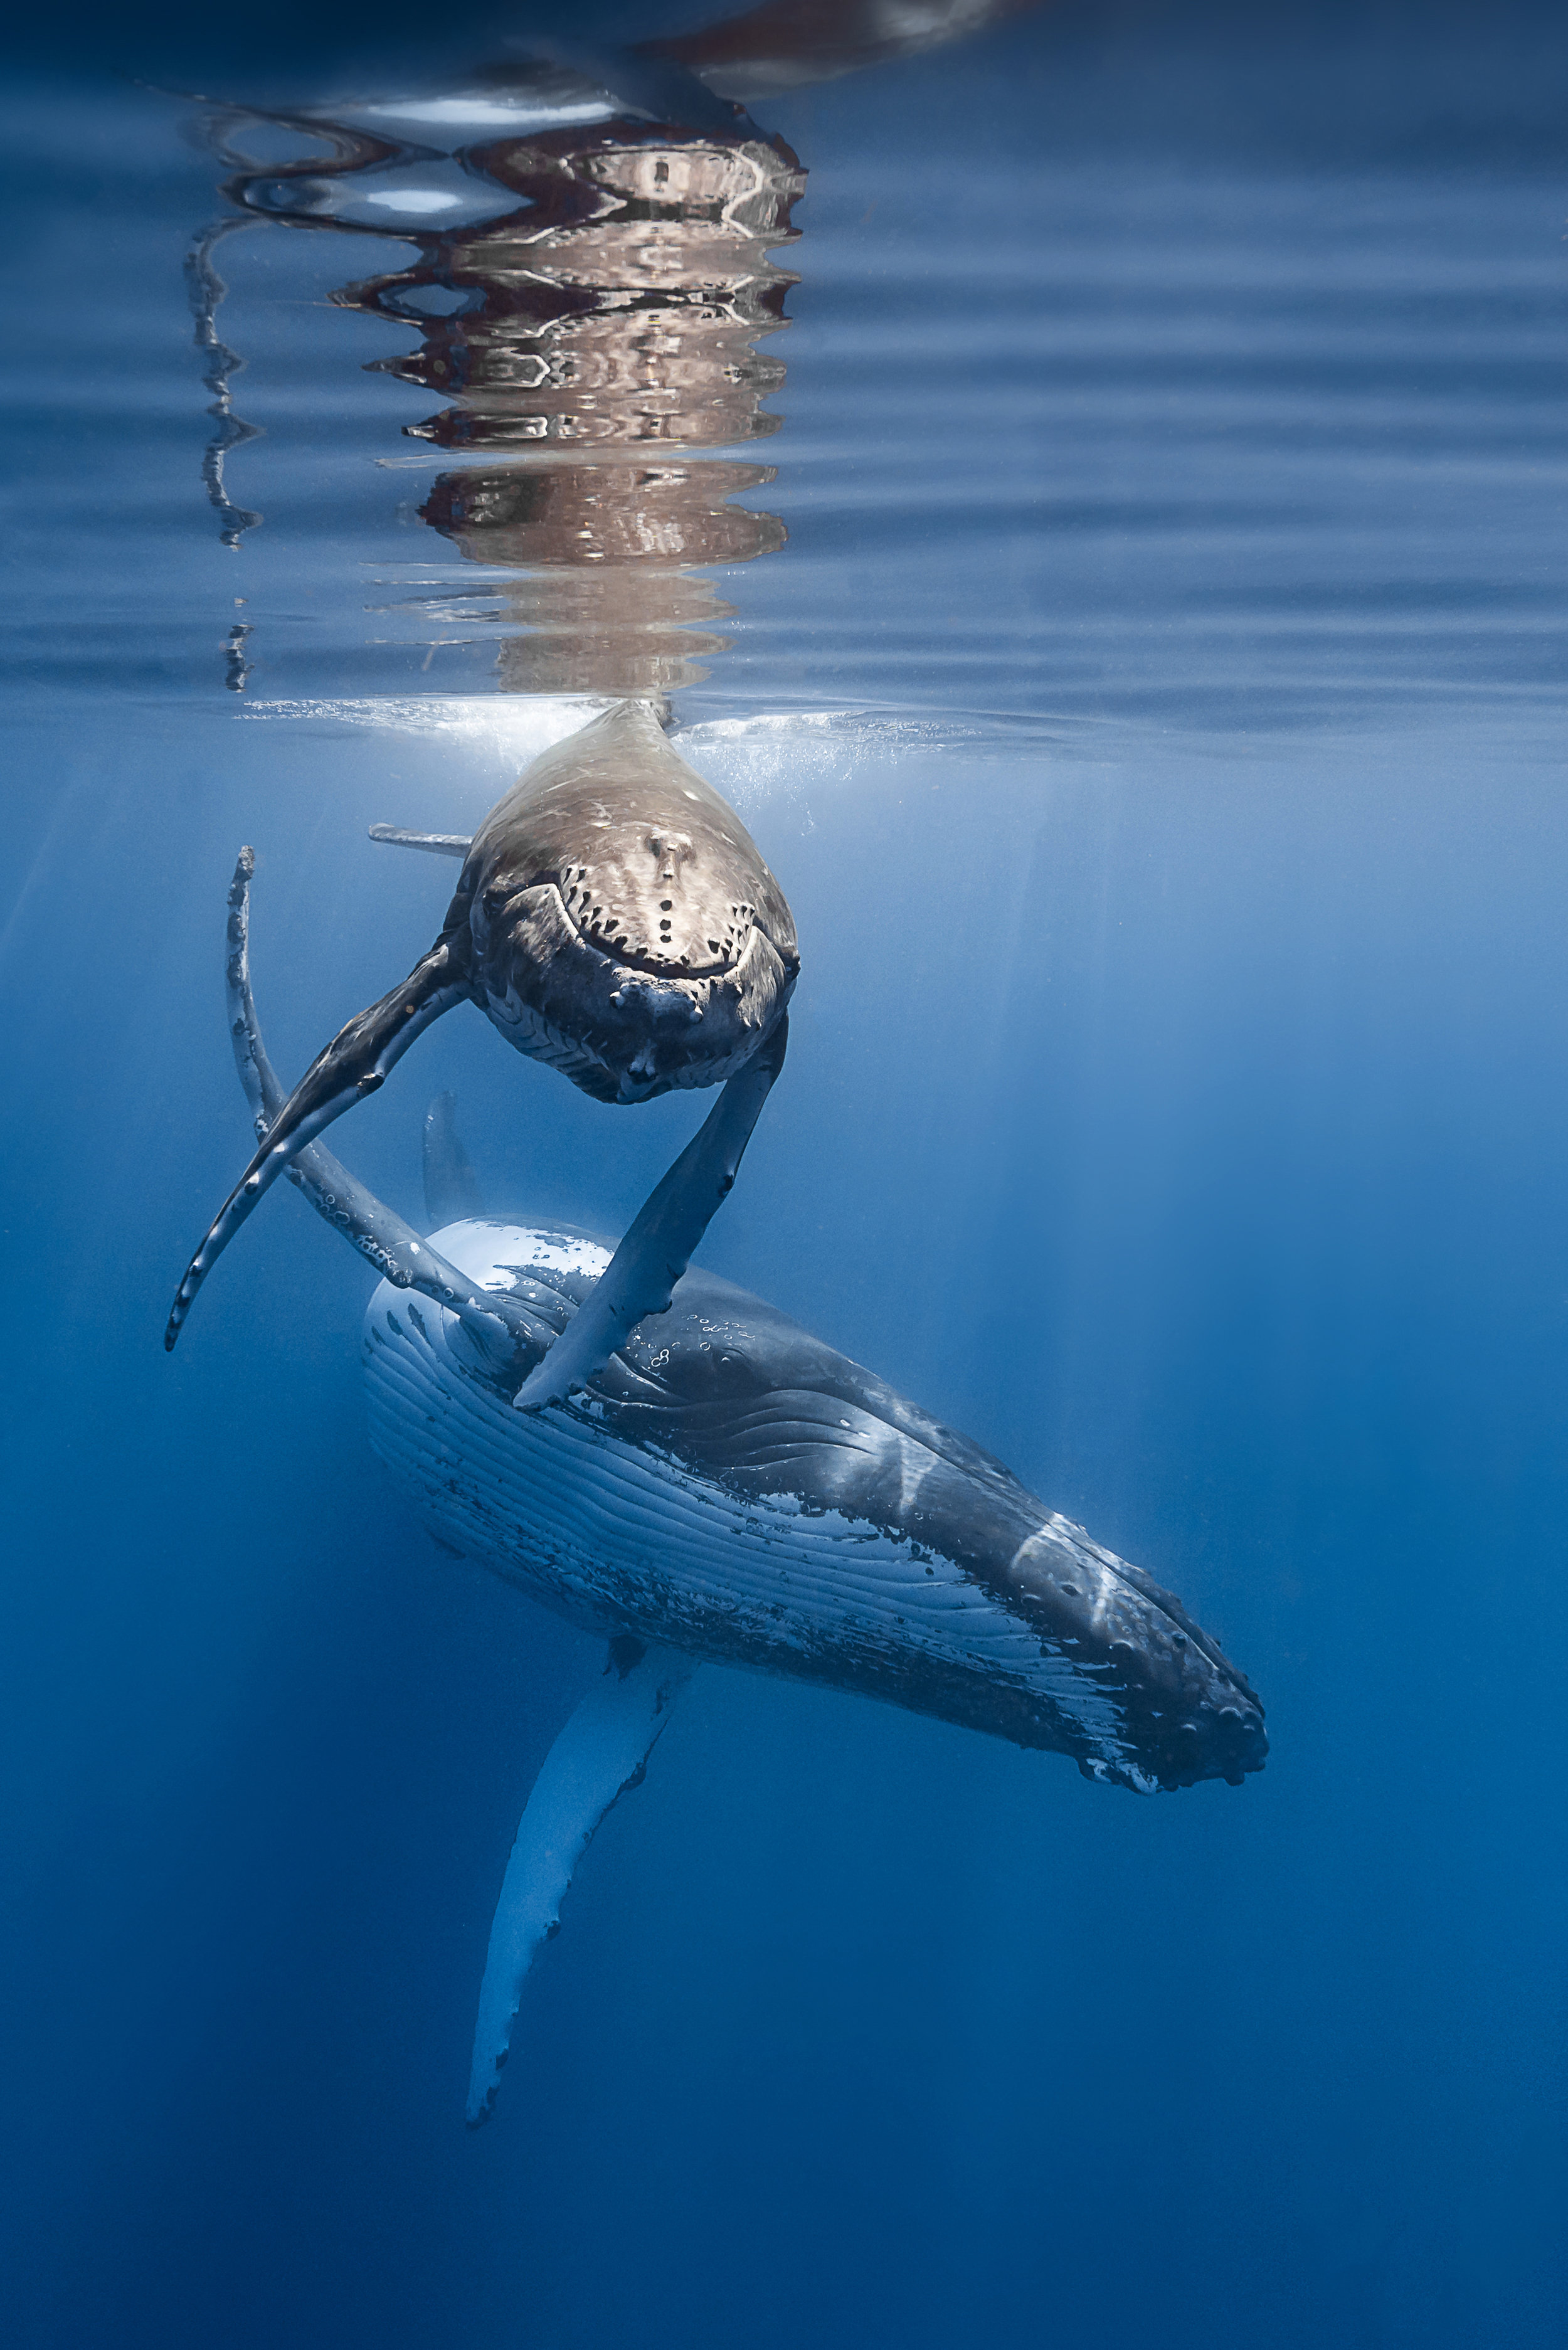 humpbacks credit: François Baelen / coral reef image bank